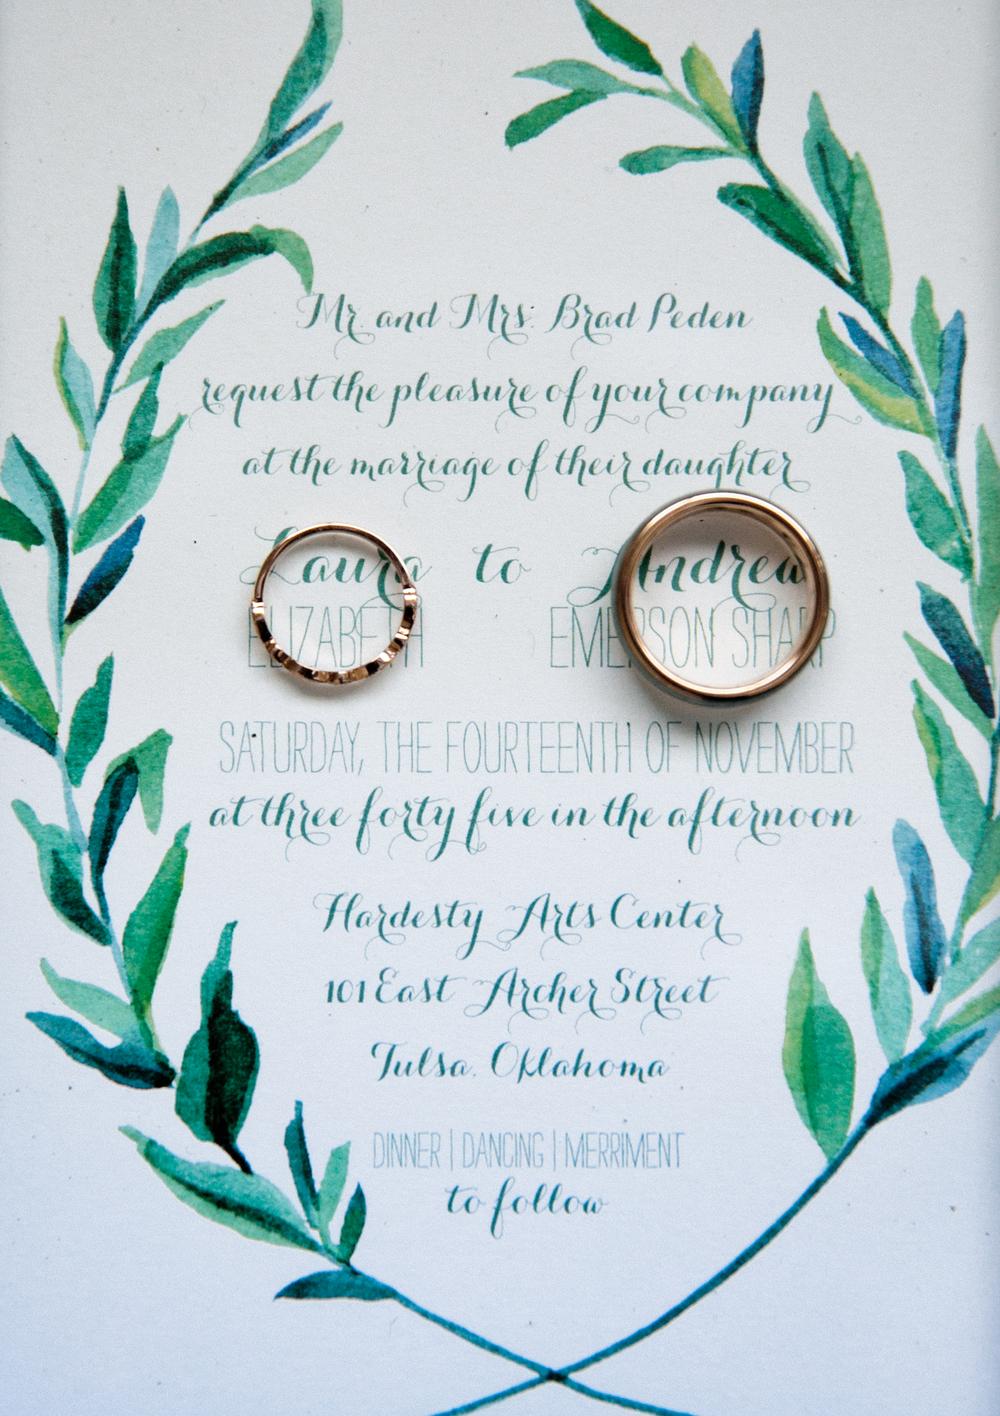 tulsa_oklahoma_wedding-8.jpg